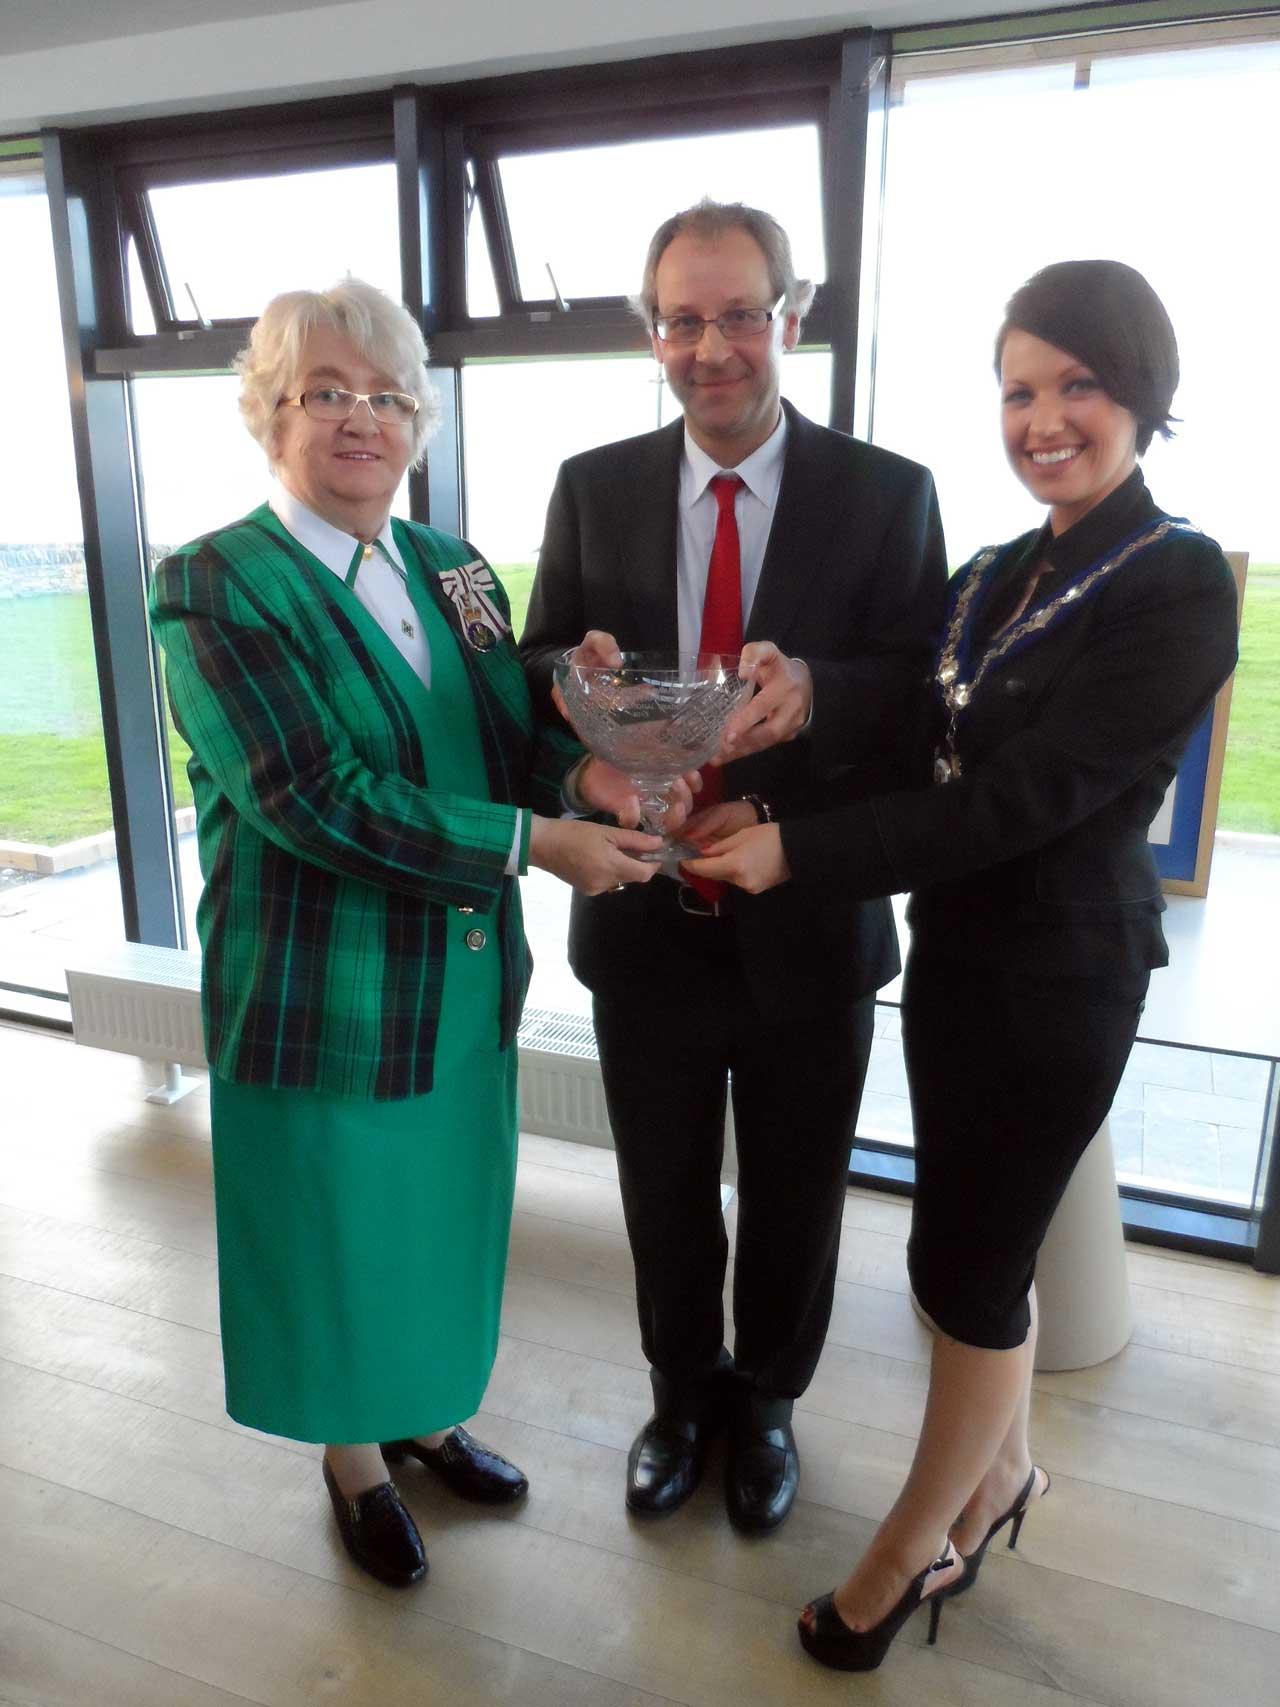 Photo: Lord Lieutenant Anne Dunnet, Prof. Ian Baikie, Civic Leader Councillor Gail Ross